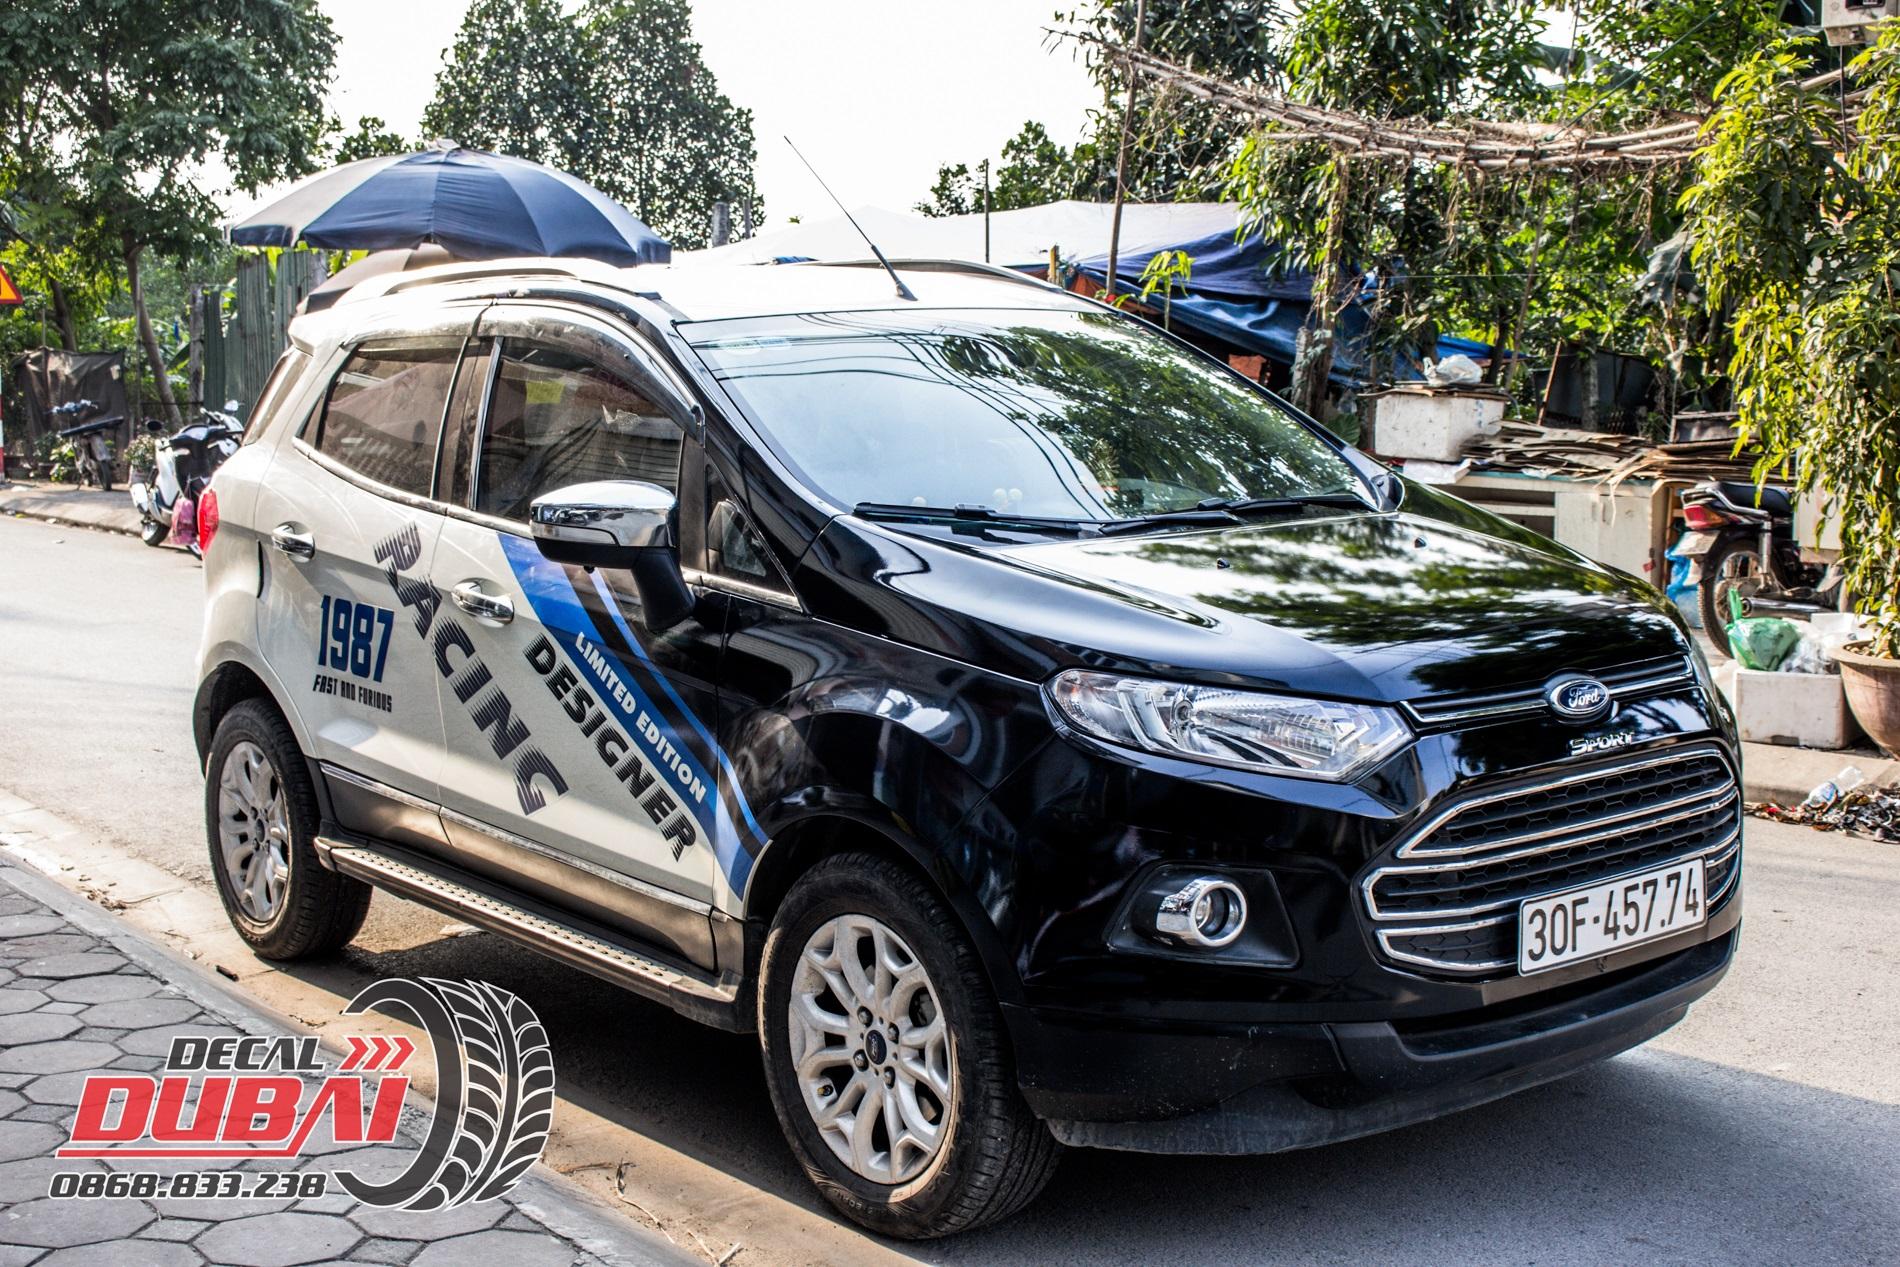 Tem-Xe-Ecosport-0008.7-2600k